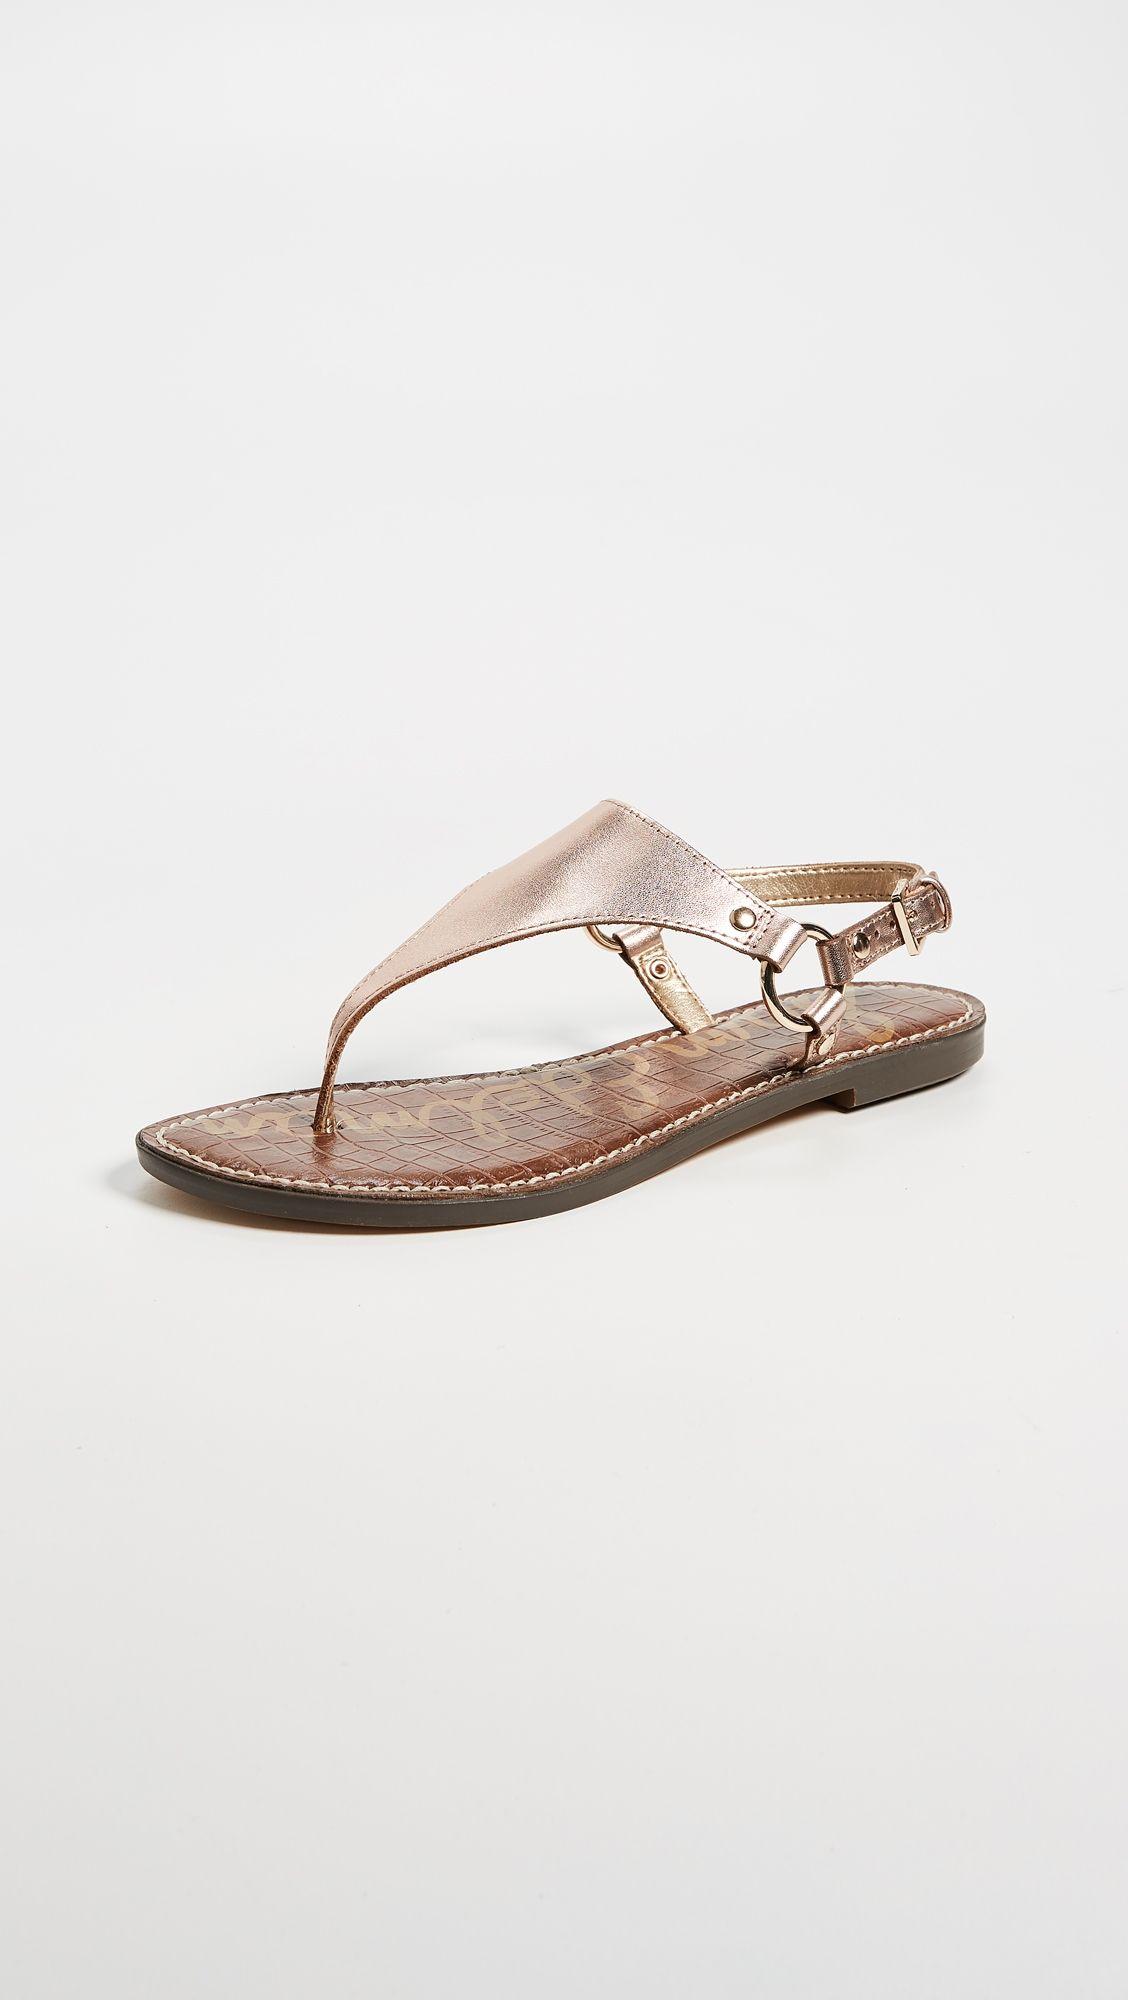 47dc544fac8b Sam Edelman Greta Flat Sandals